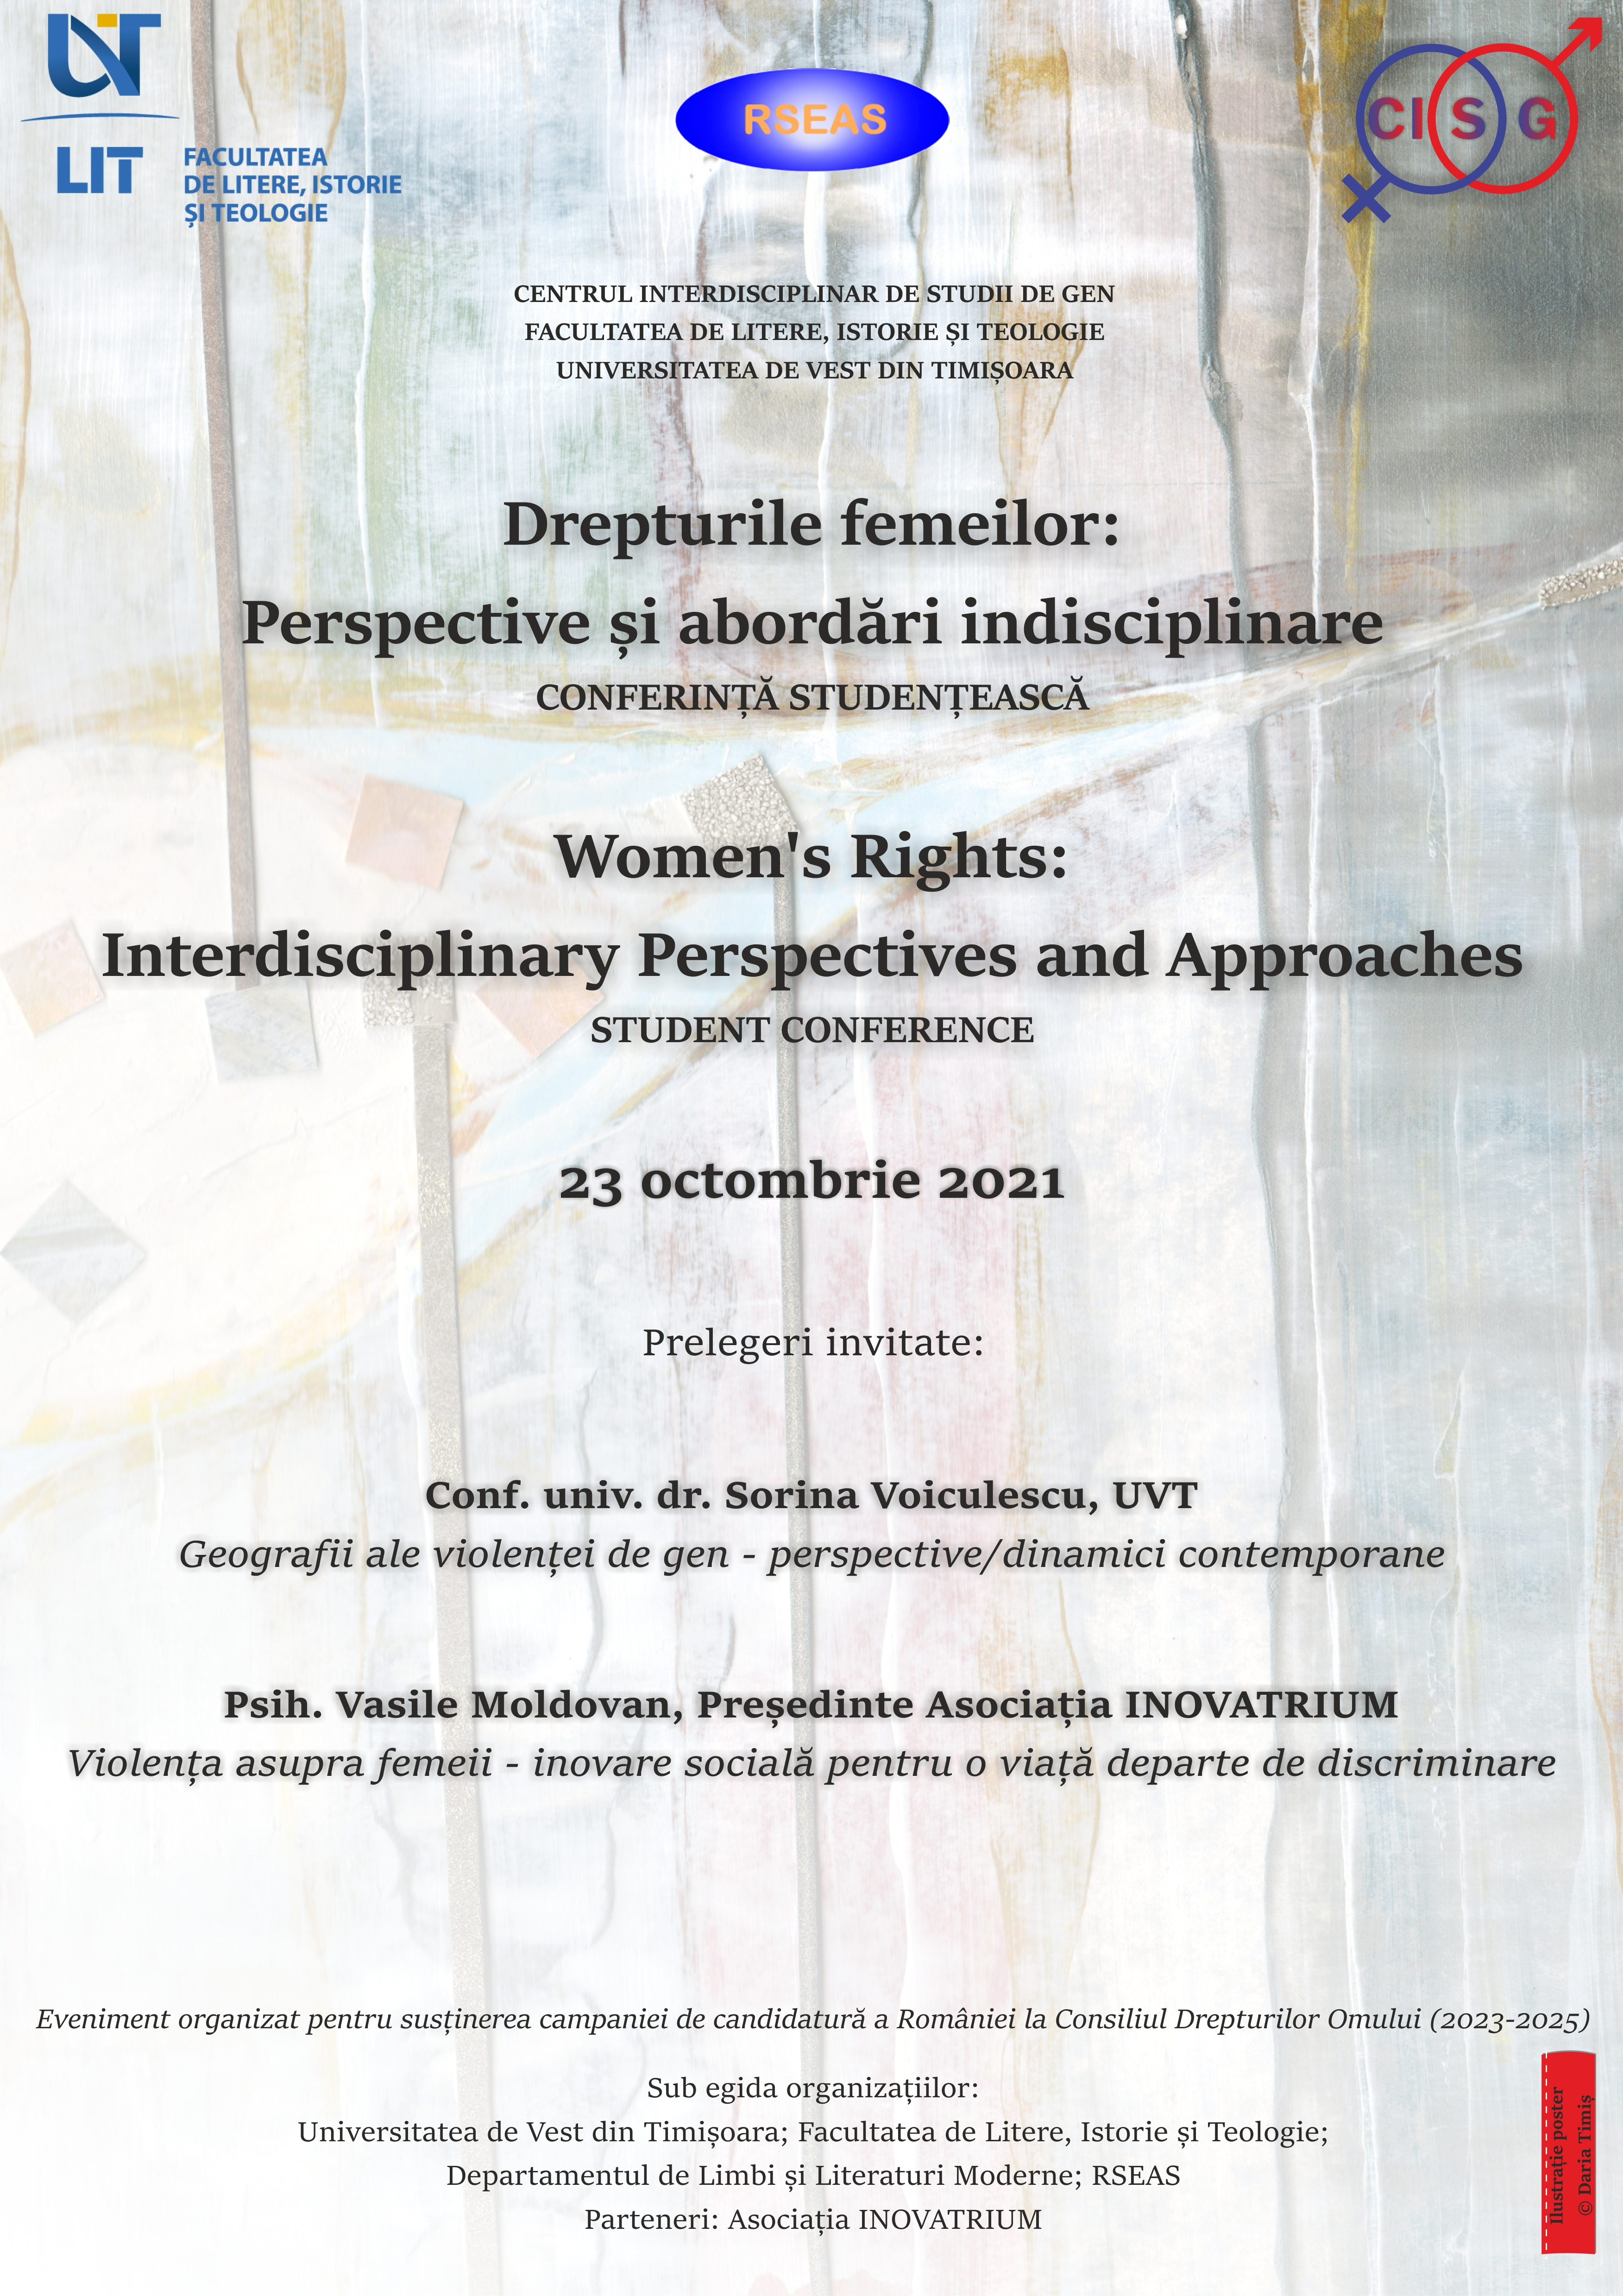 2021-10-Drepturile-femeilor-CISG-Portrtait-RGB